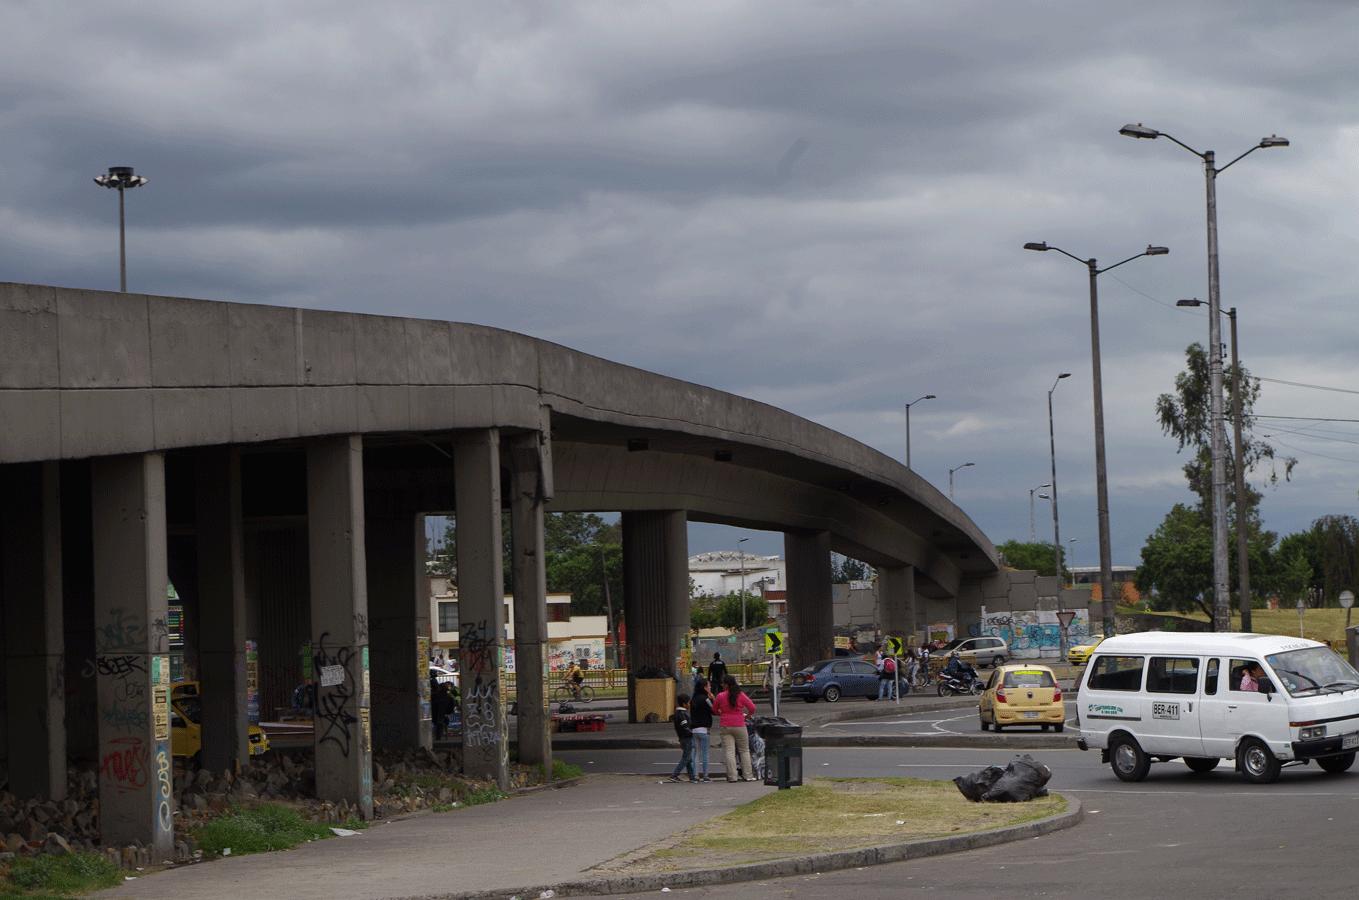 Puente-Av-1-de-Mayo-1